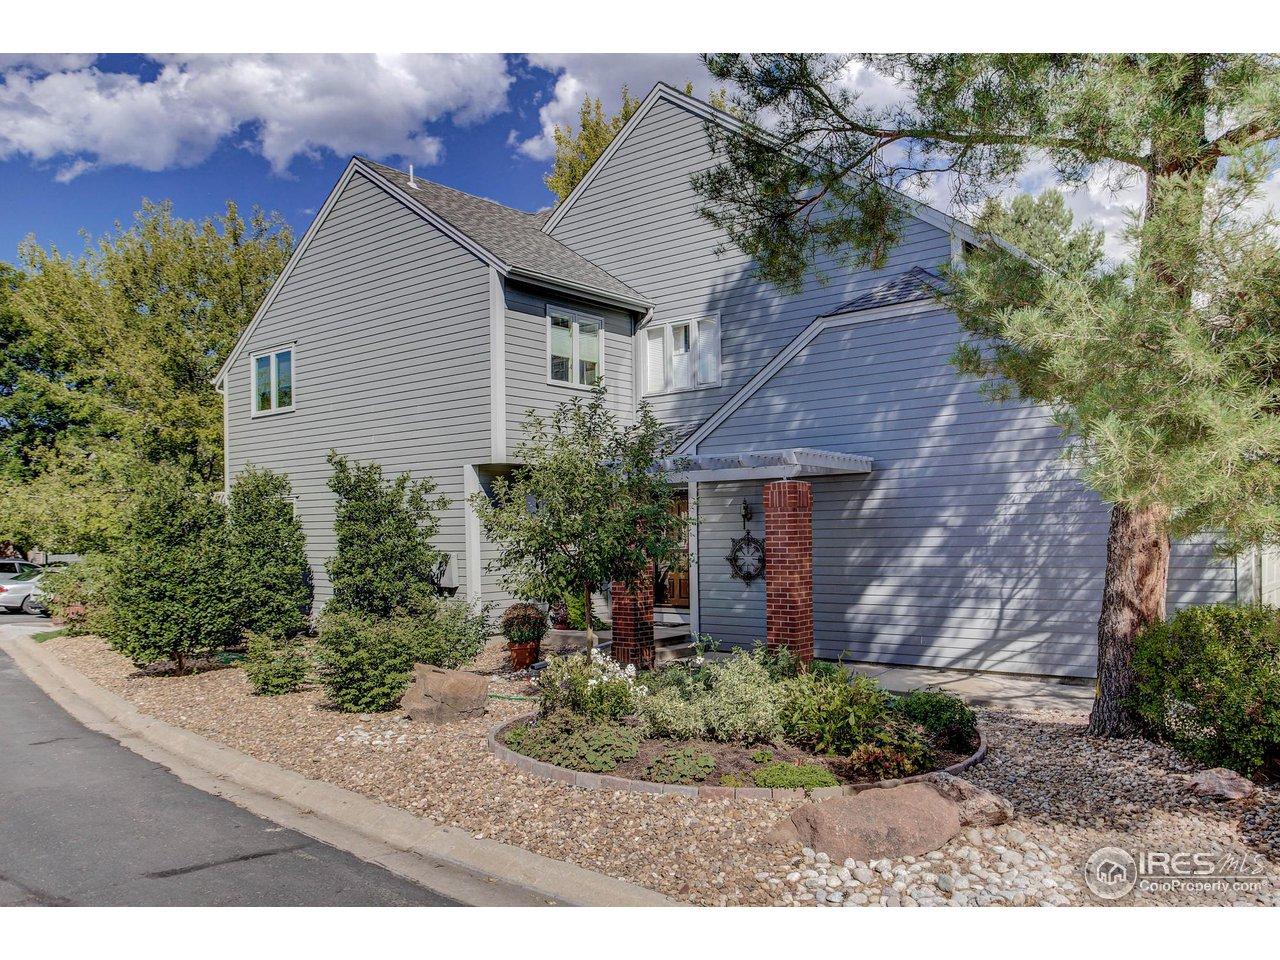 7267 Siena Way, Boulder CO 80301